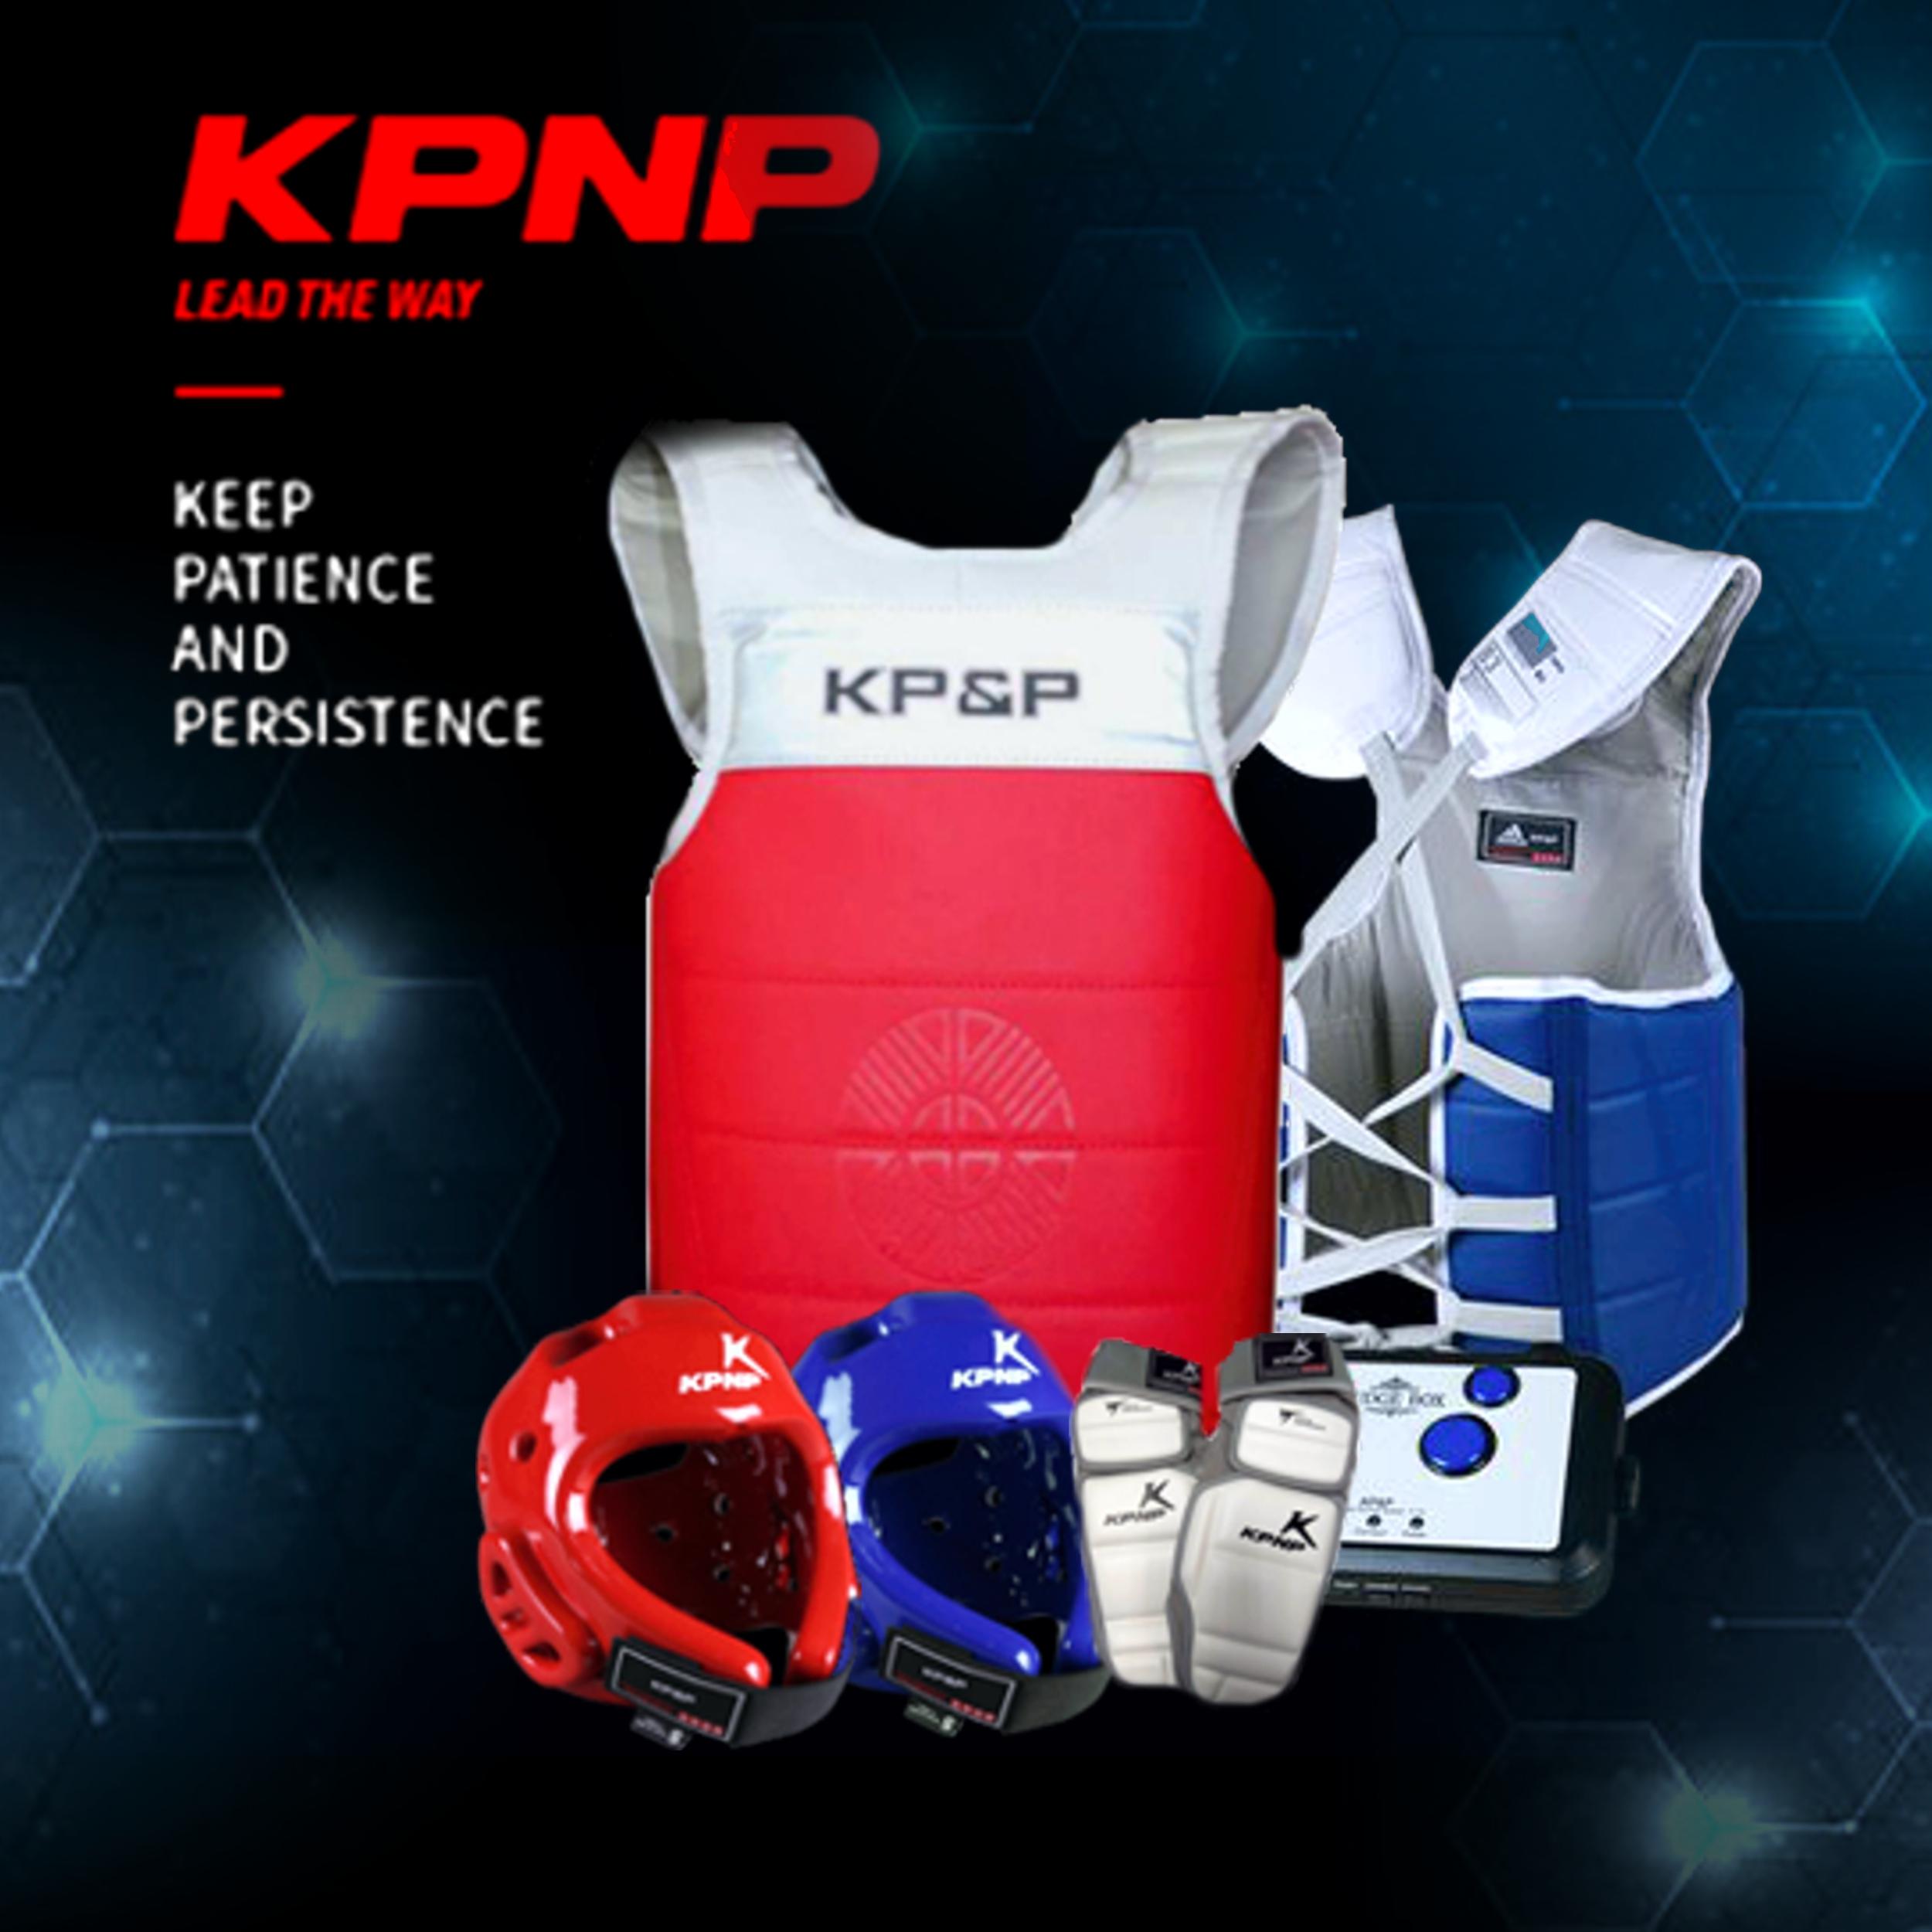 KP&P ONE SET